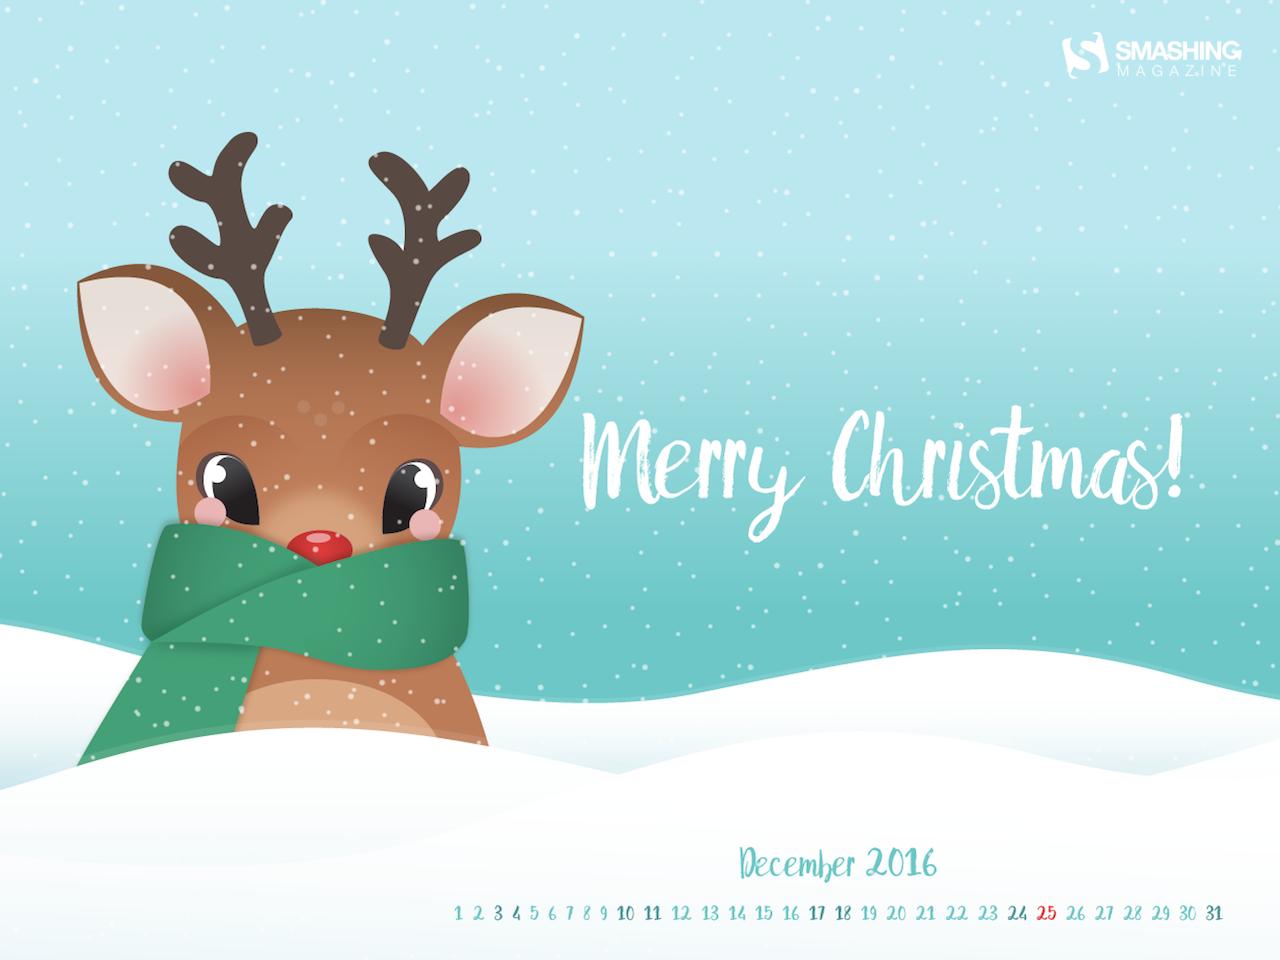 merry christmas - How Do You Say Merry Christmas In Australia